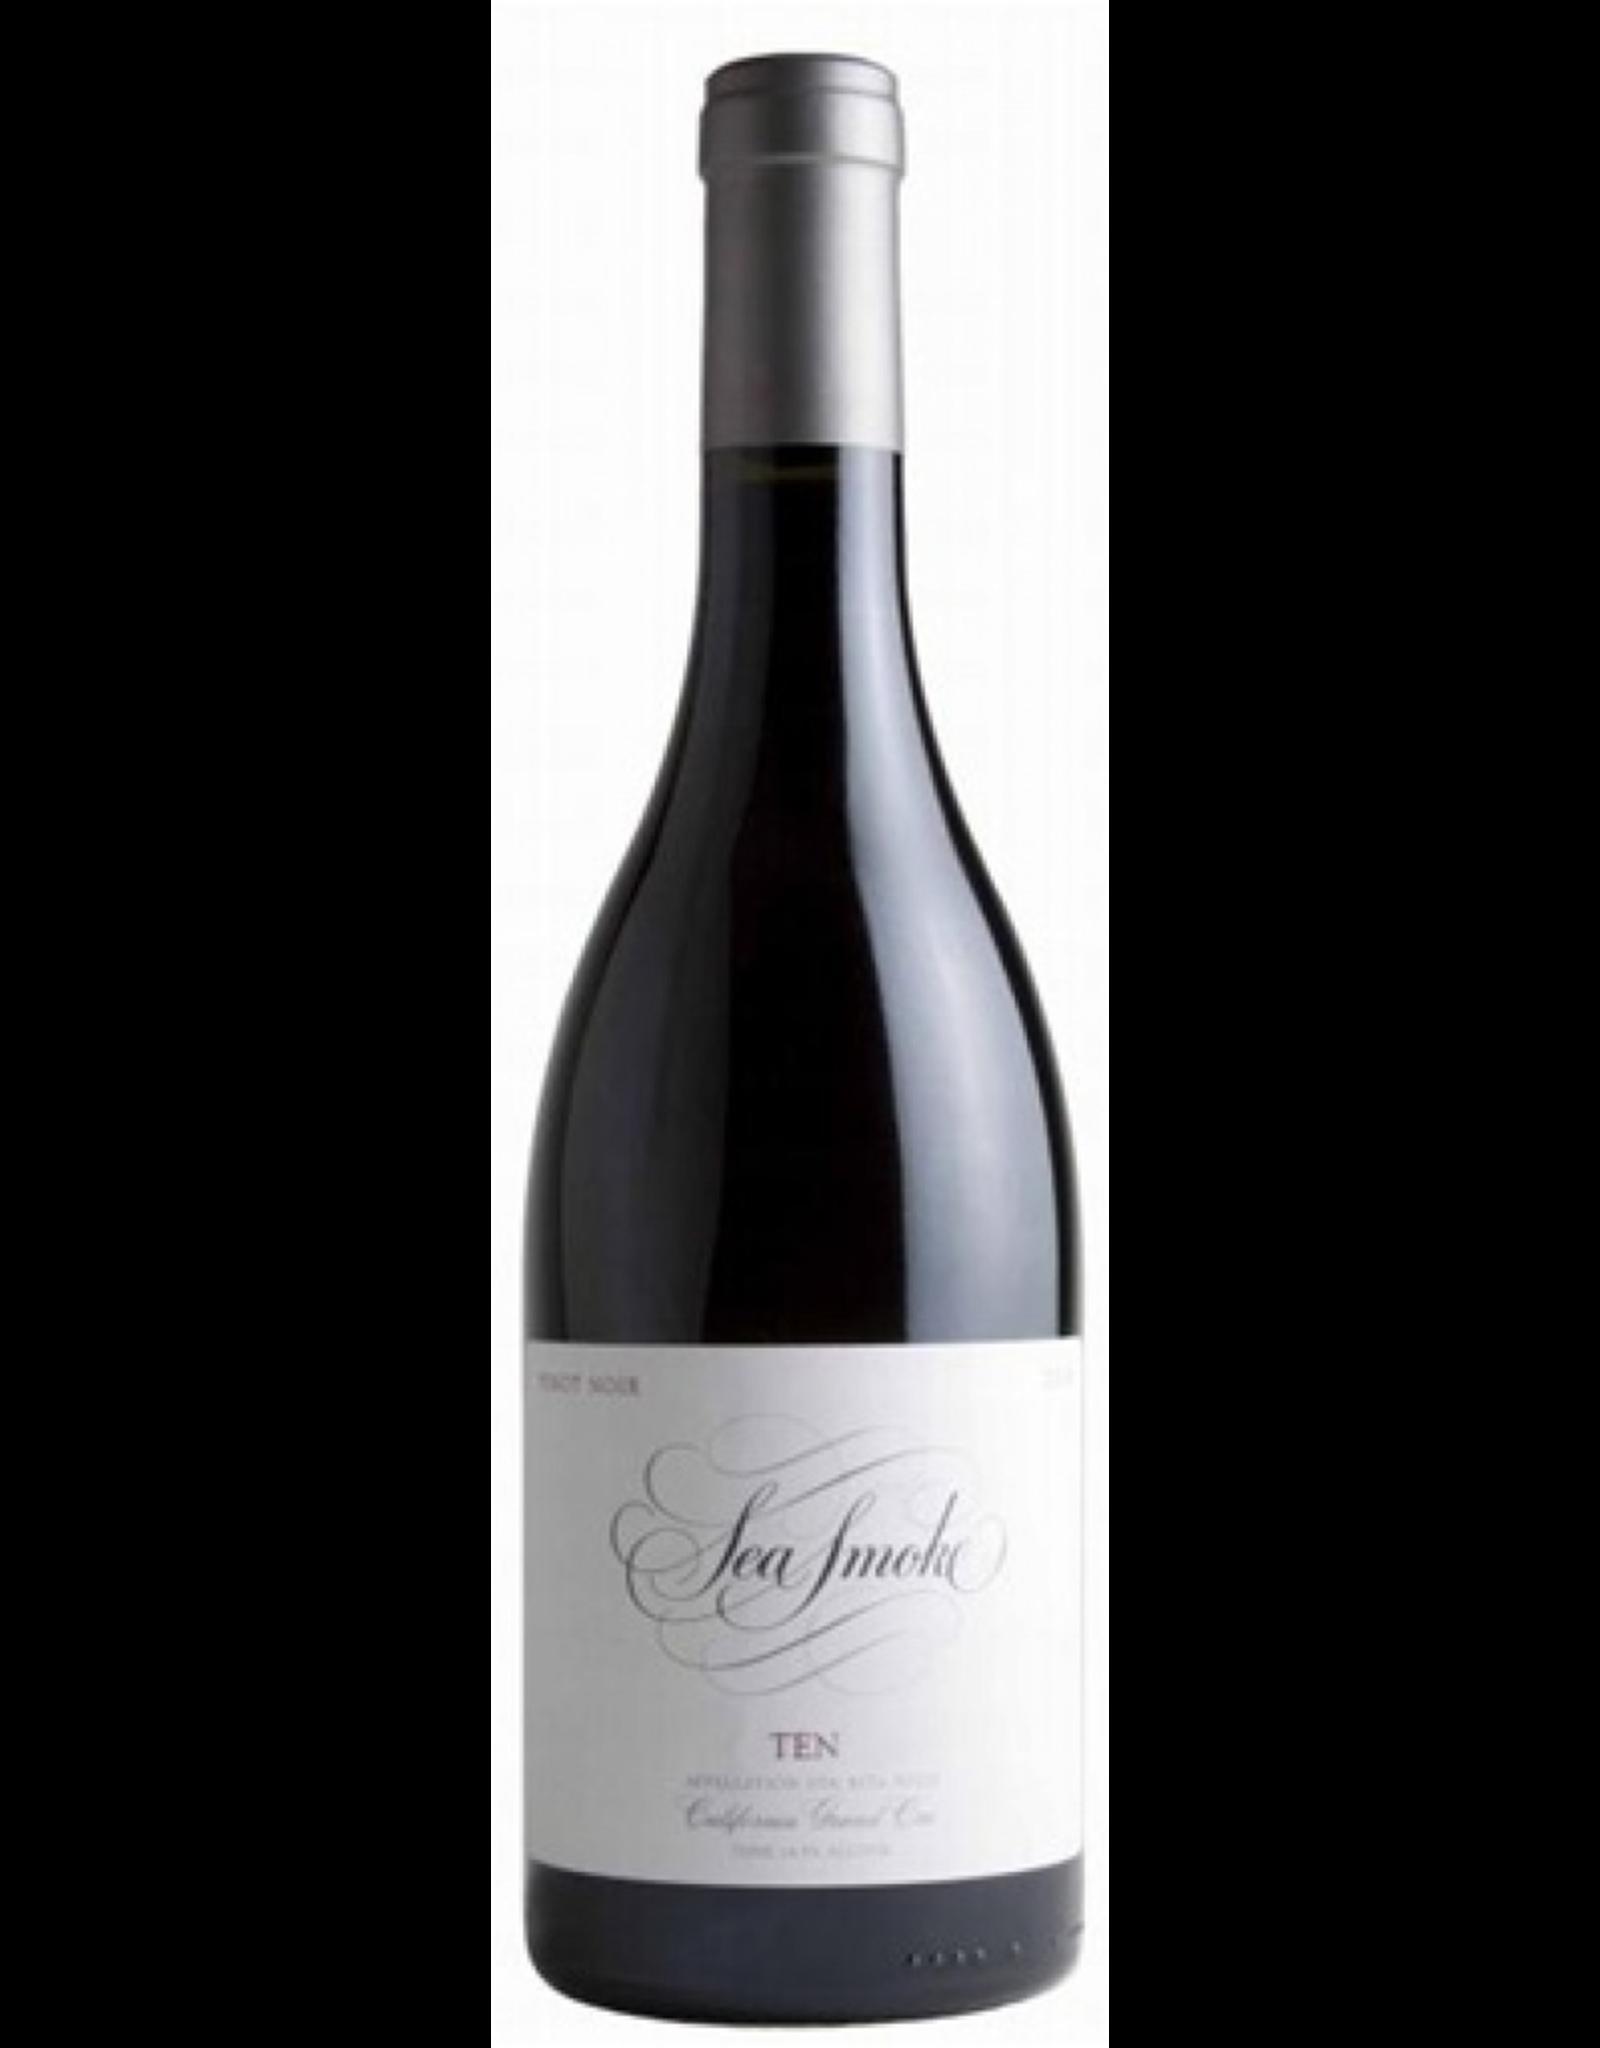 Red Wine 2014, Sea Smoke Ten, Pinot Noir, Sta. Rita Hills, Central Coast, California, 14.5% Alc, CT92